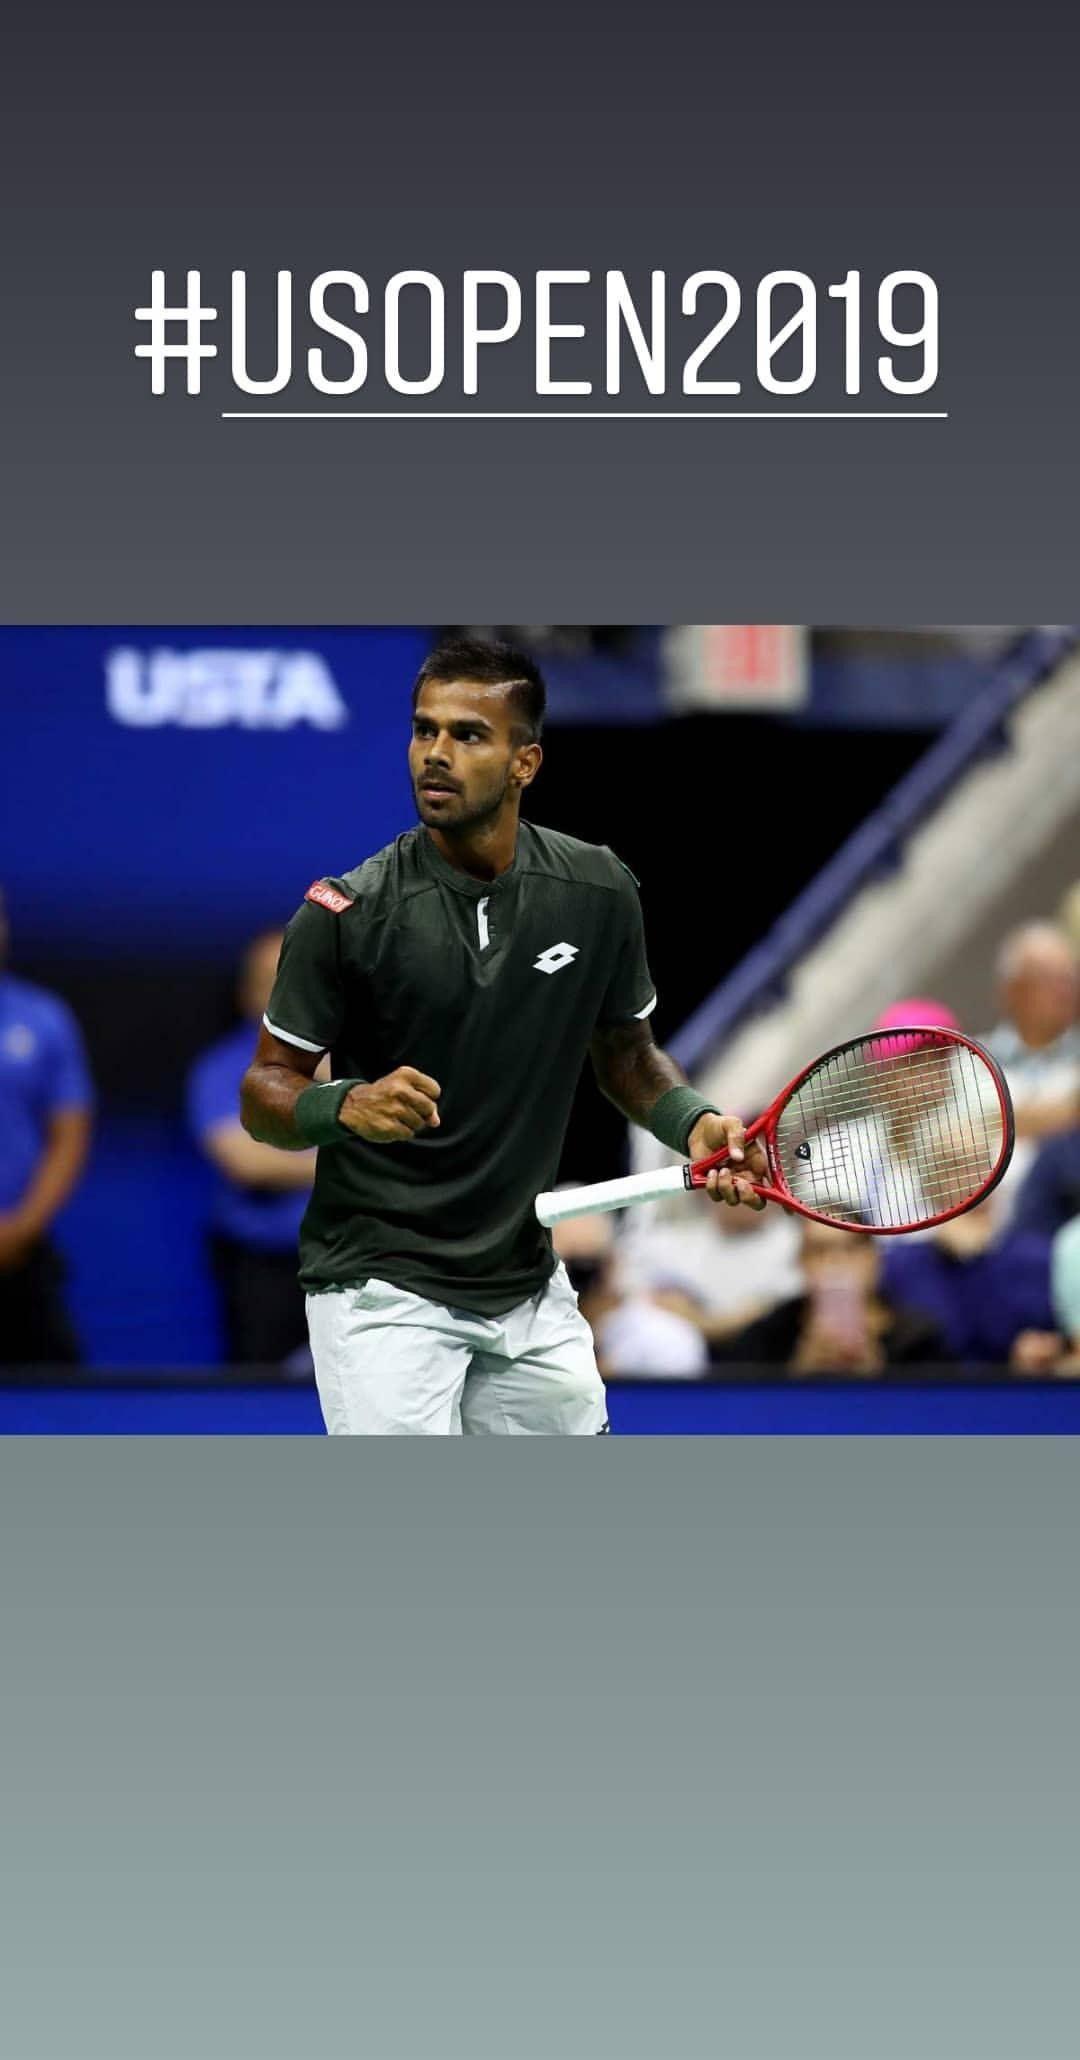 Sumitnagal Becomes The First Indian To Win A Set Against Rogerfederer Usopen Usopen2019 Sumit Nagal Won Many Hearts Wel Roger Federer Grand Slam Tennis